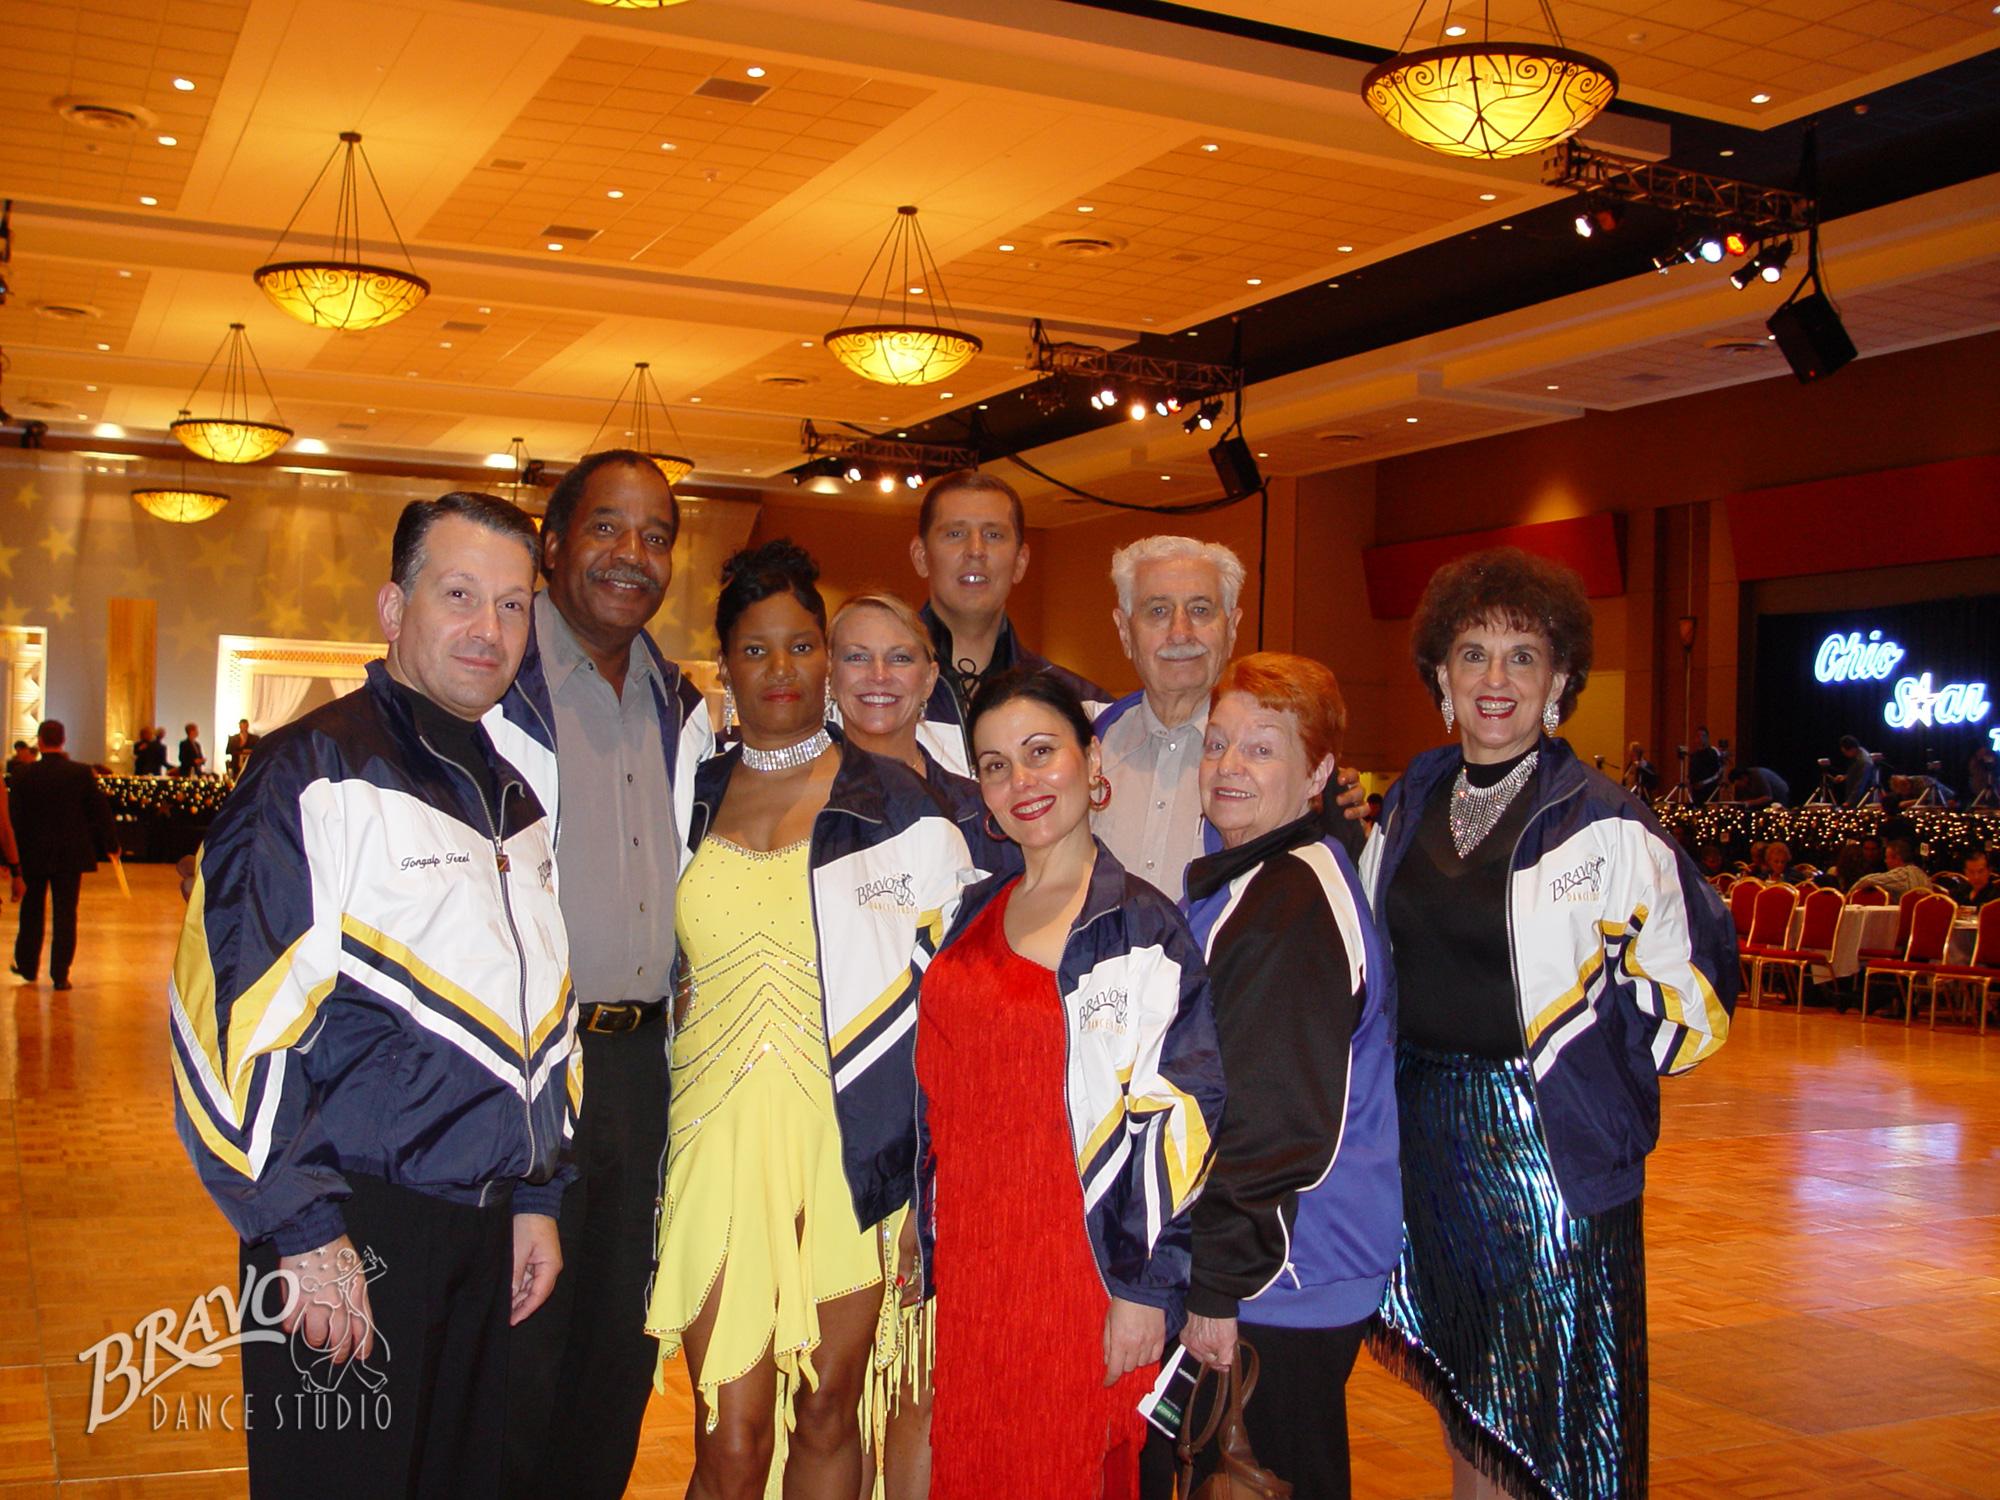 Bravo-Am-Am-Dancers-1-(11).jpg